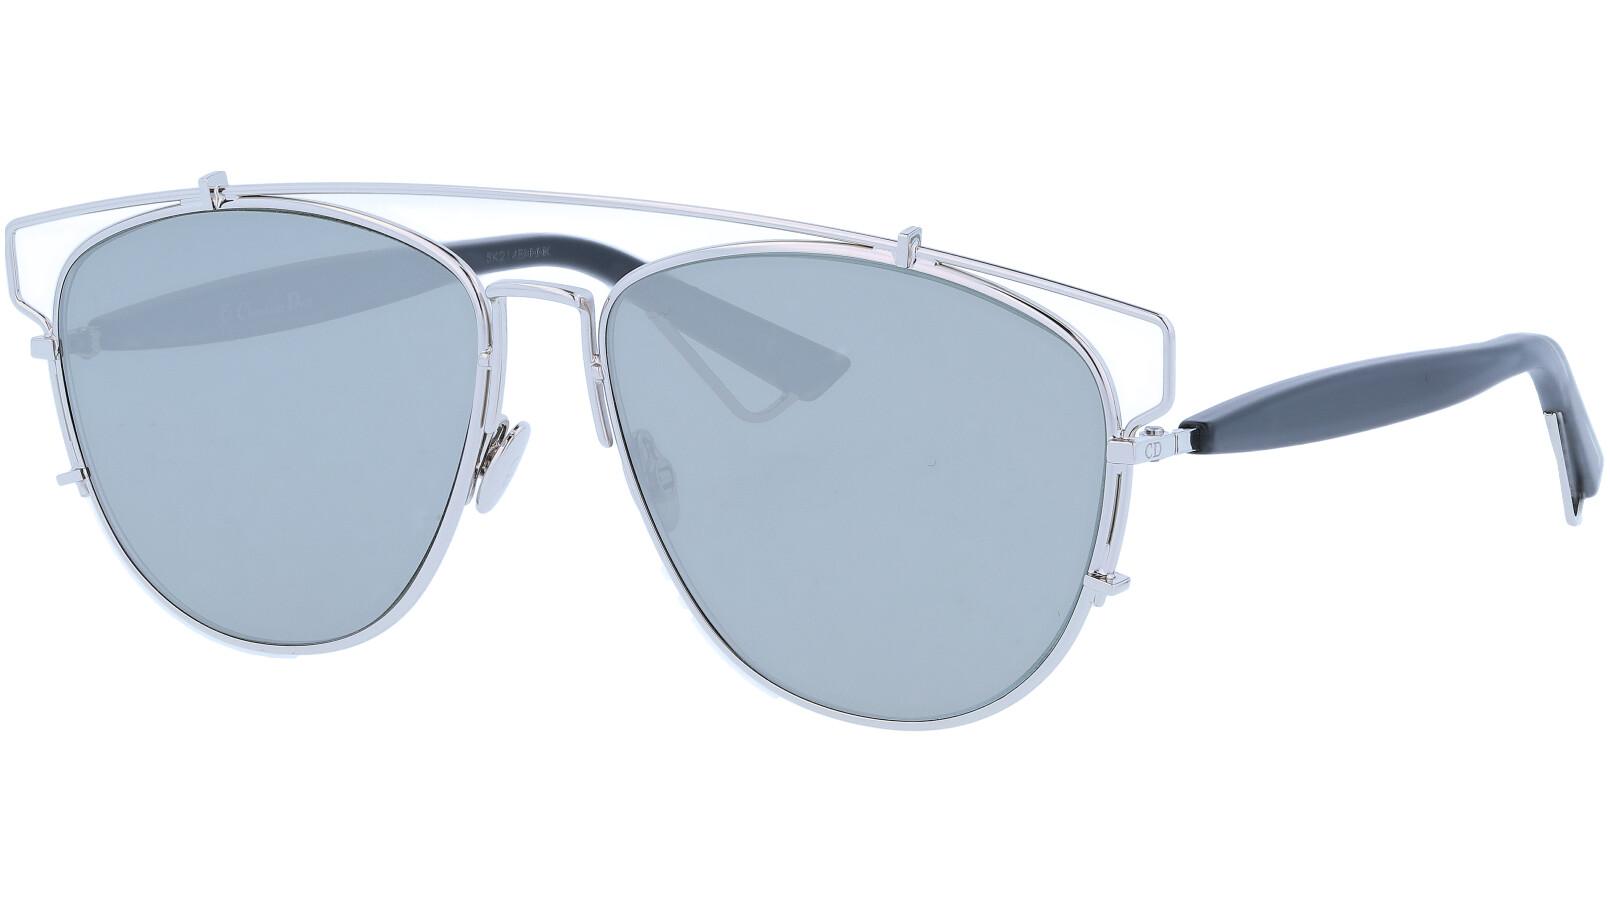 Dior Technologic 84J0T 57 PALLAD Sunglasses